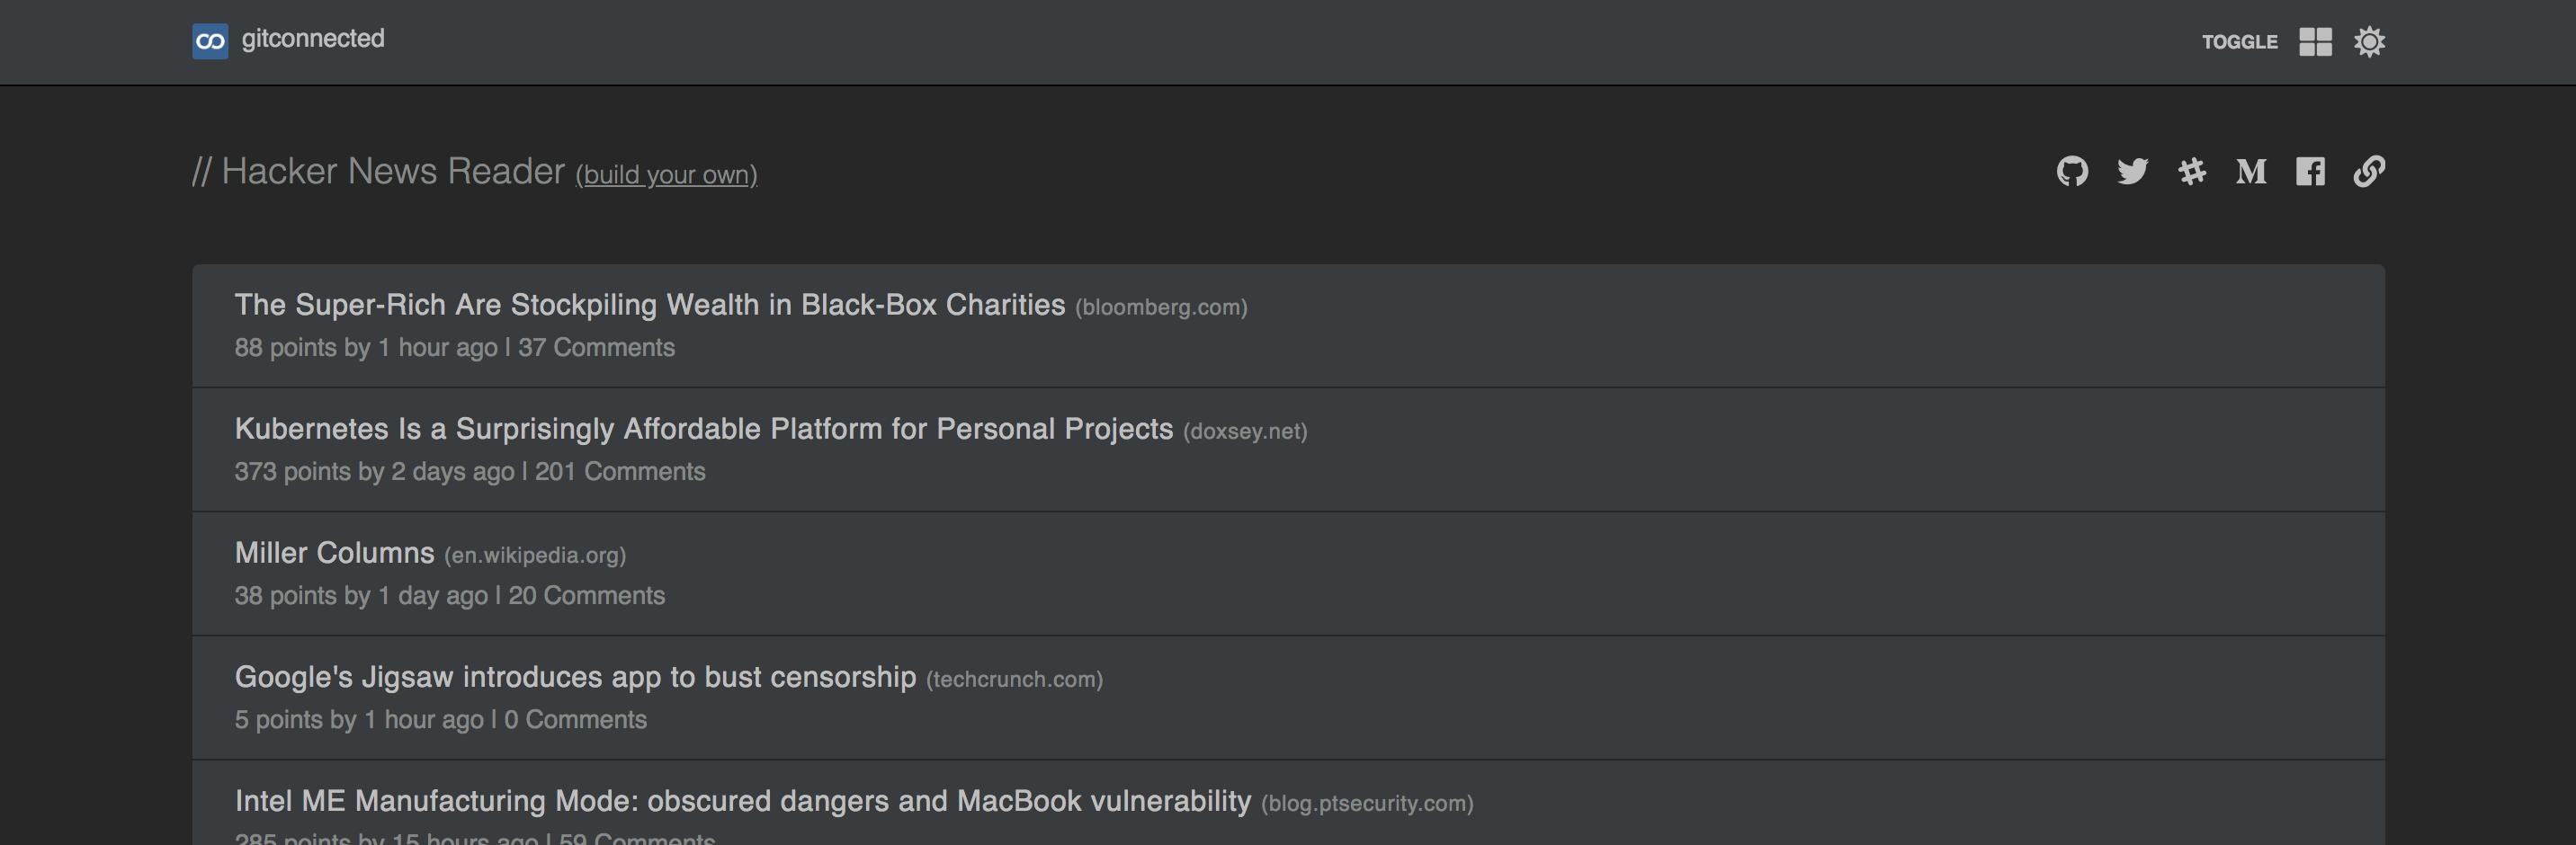 Hacktoberfest Screenshot